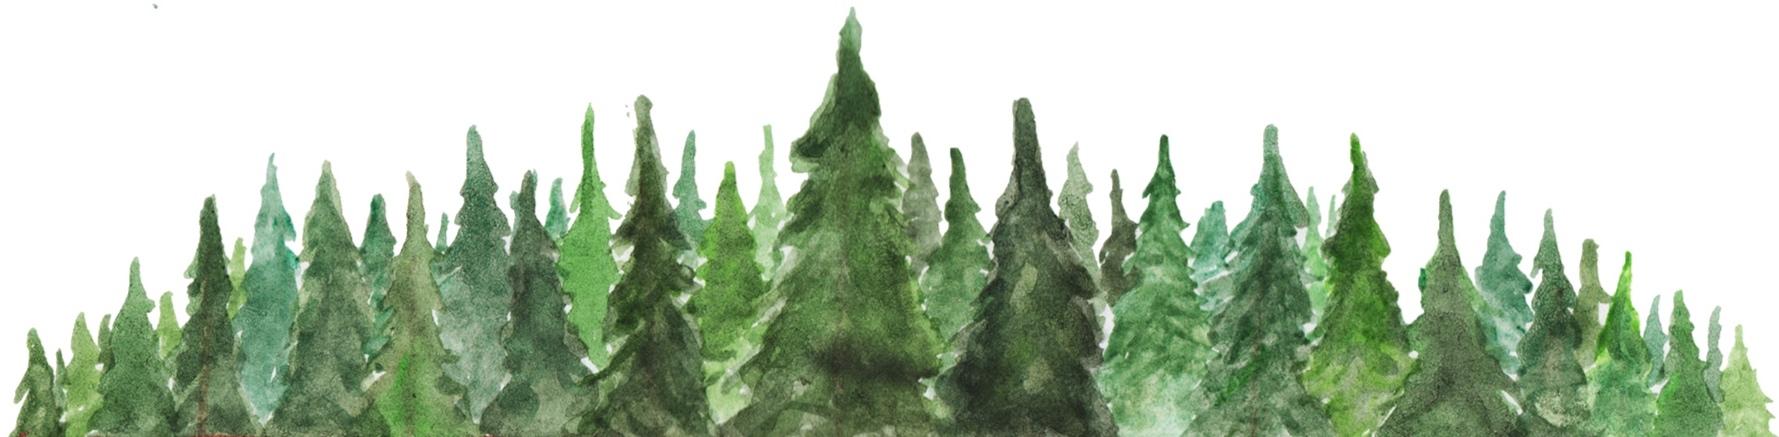 Evergreens1.jpg